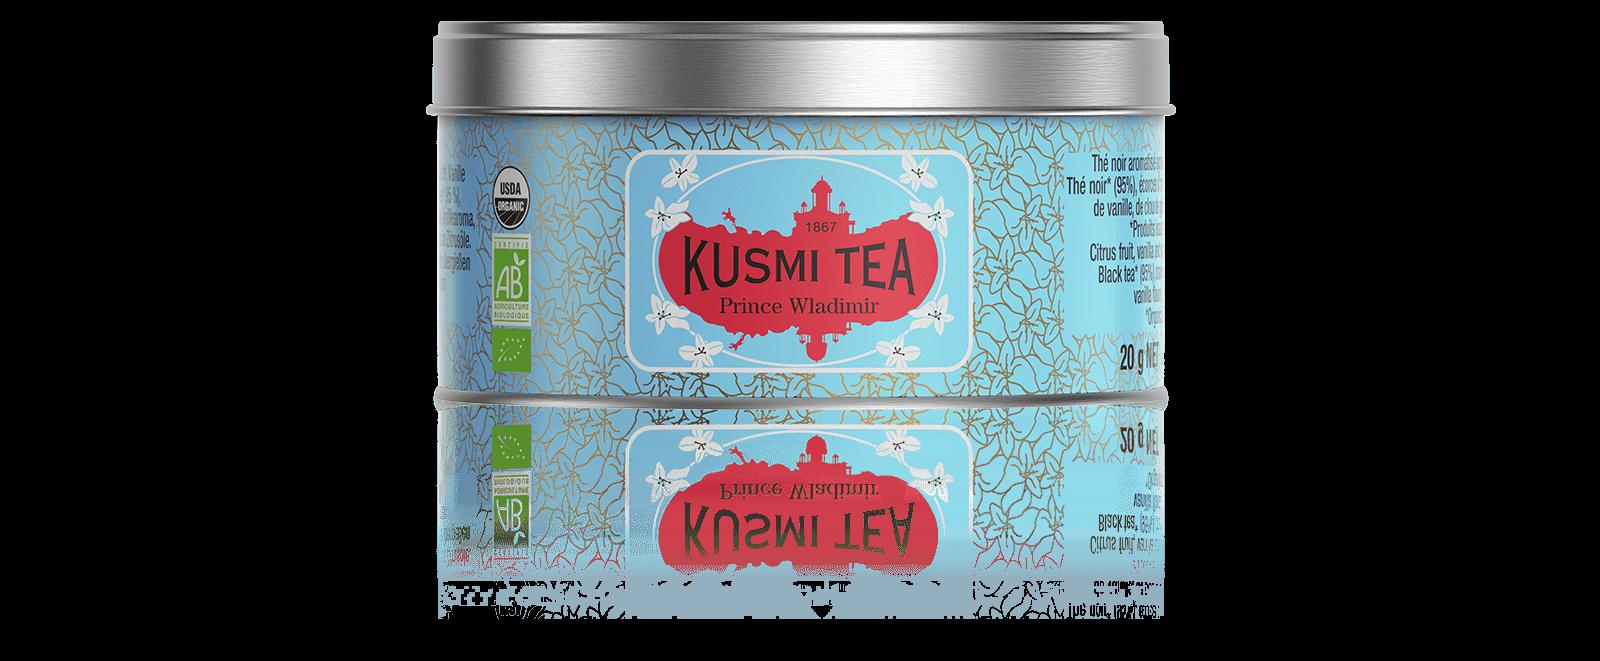 Prince Vladimir bio - Thé noir earl grey, orange - Boîte de thé en vrac - Kusmi Tea